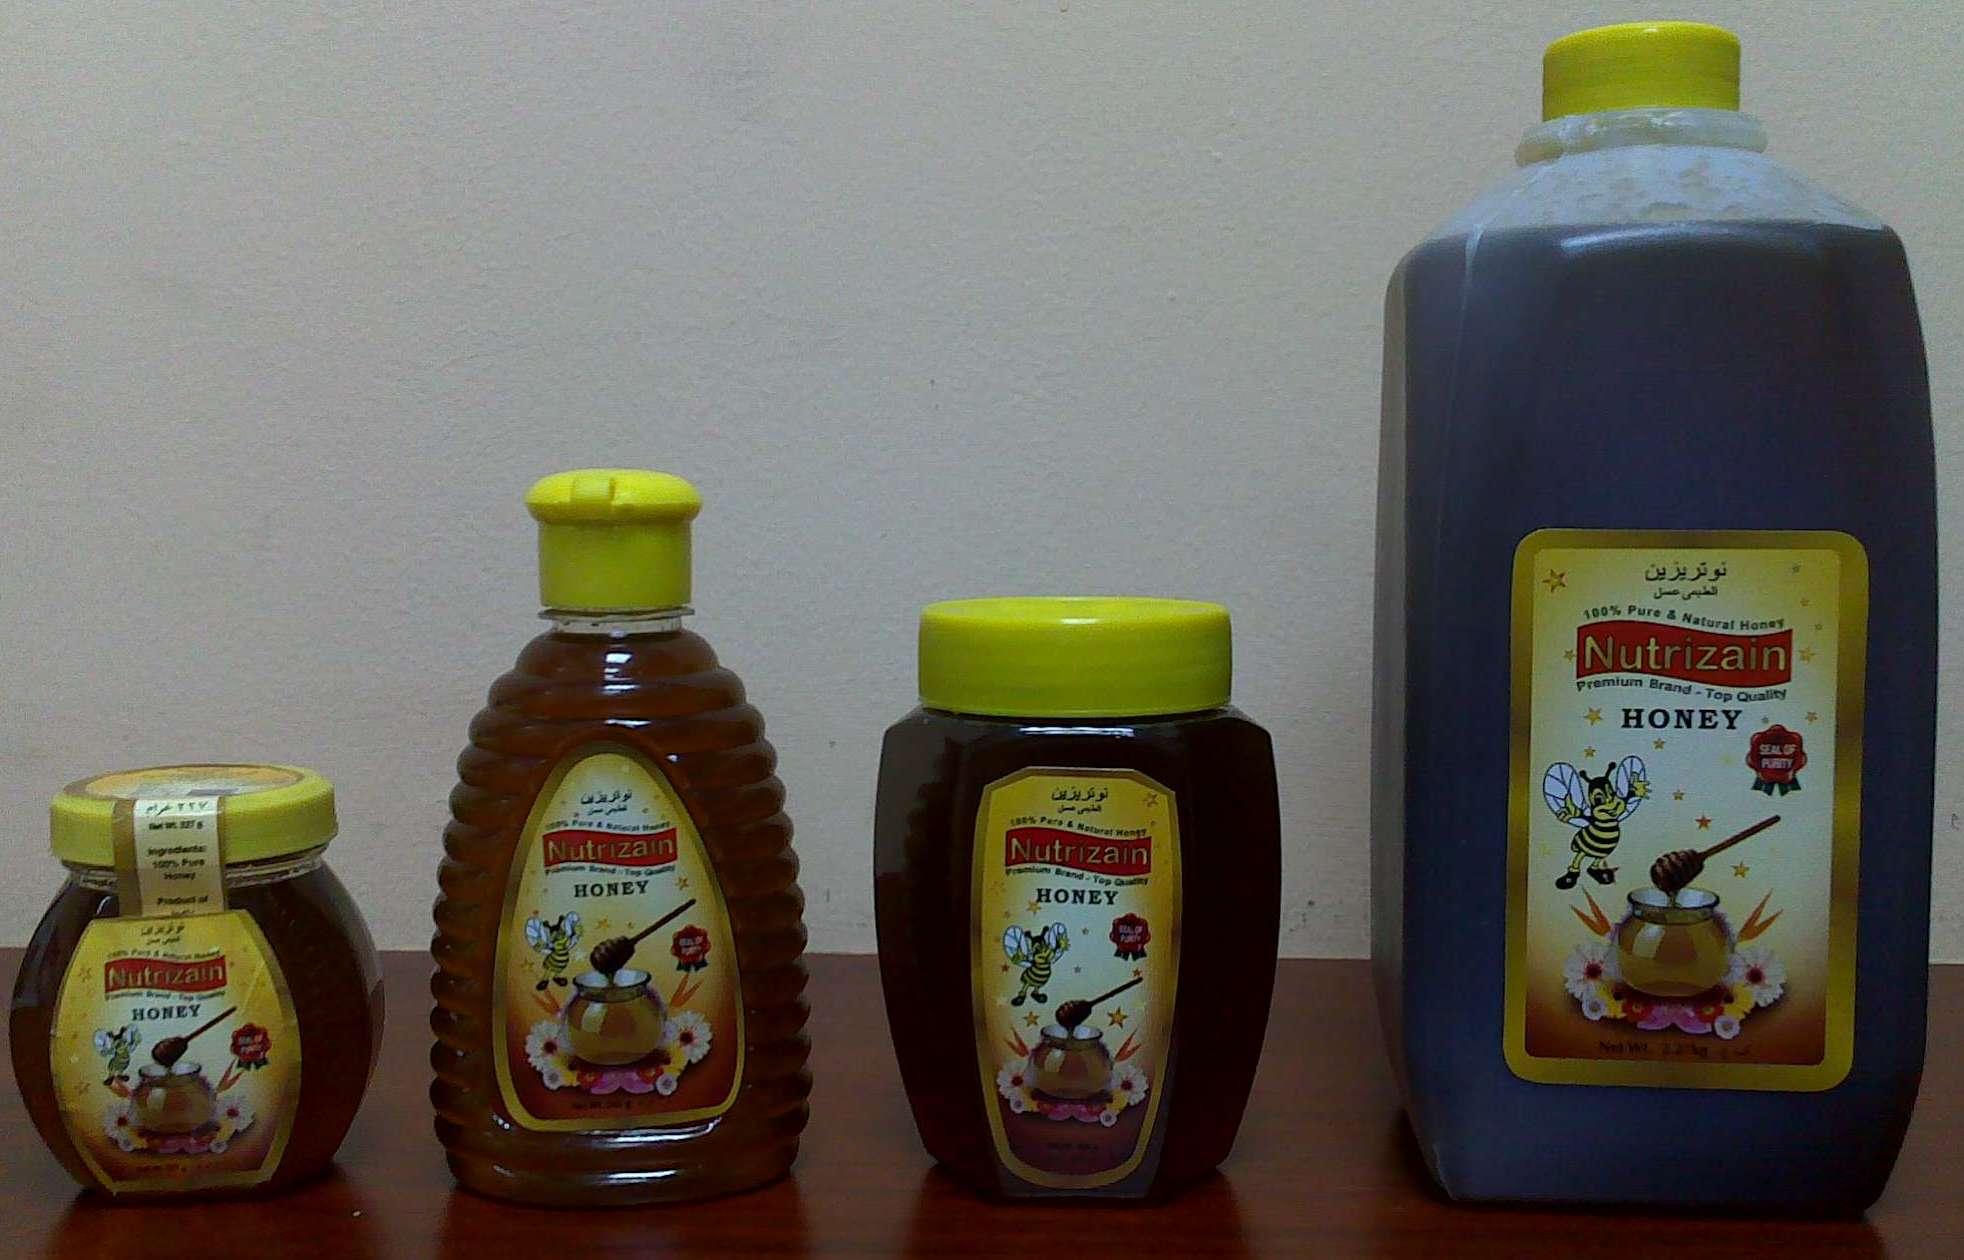 NUTRIZAIN Pure Honey products,United Arab Emirates NUTRIZAIN